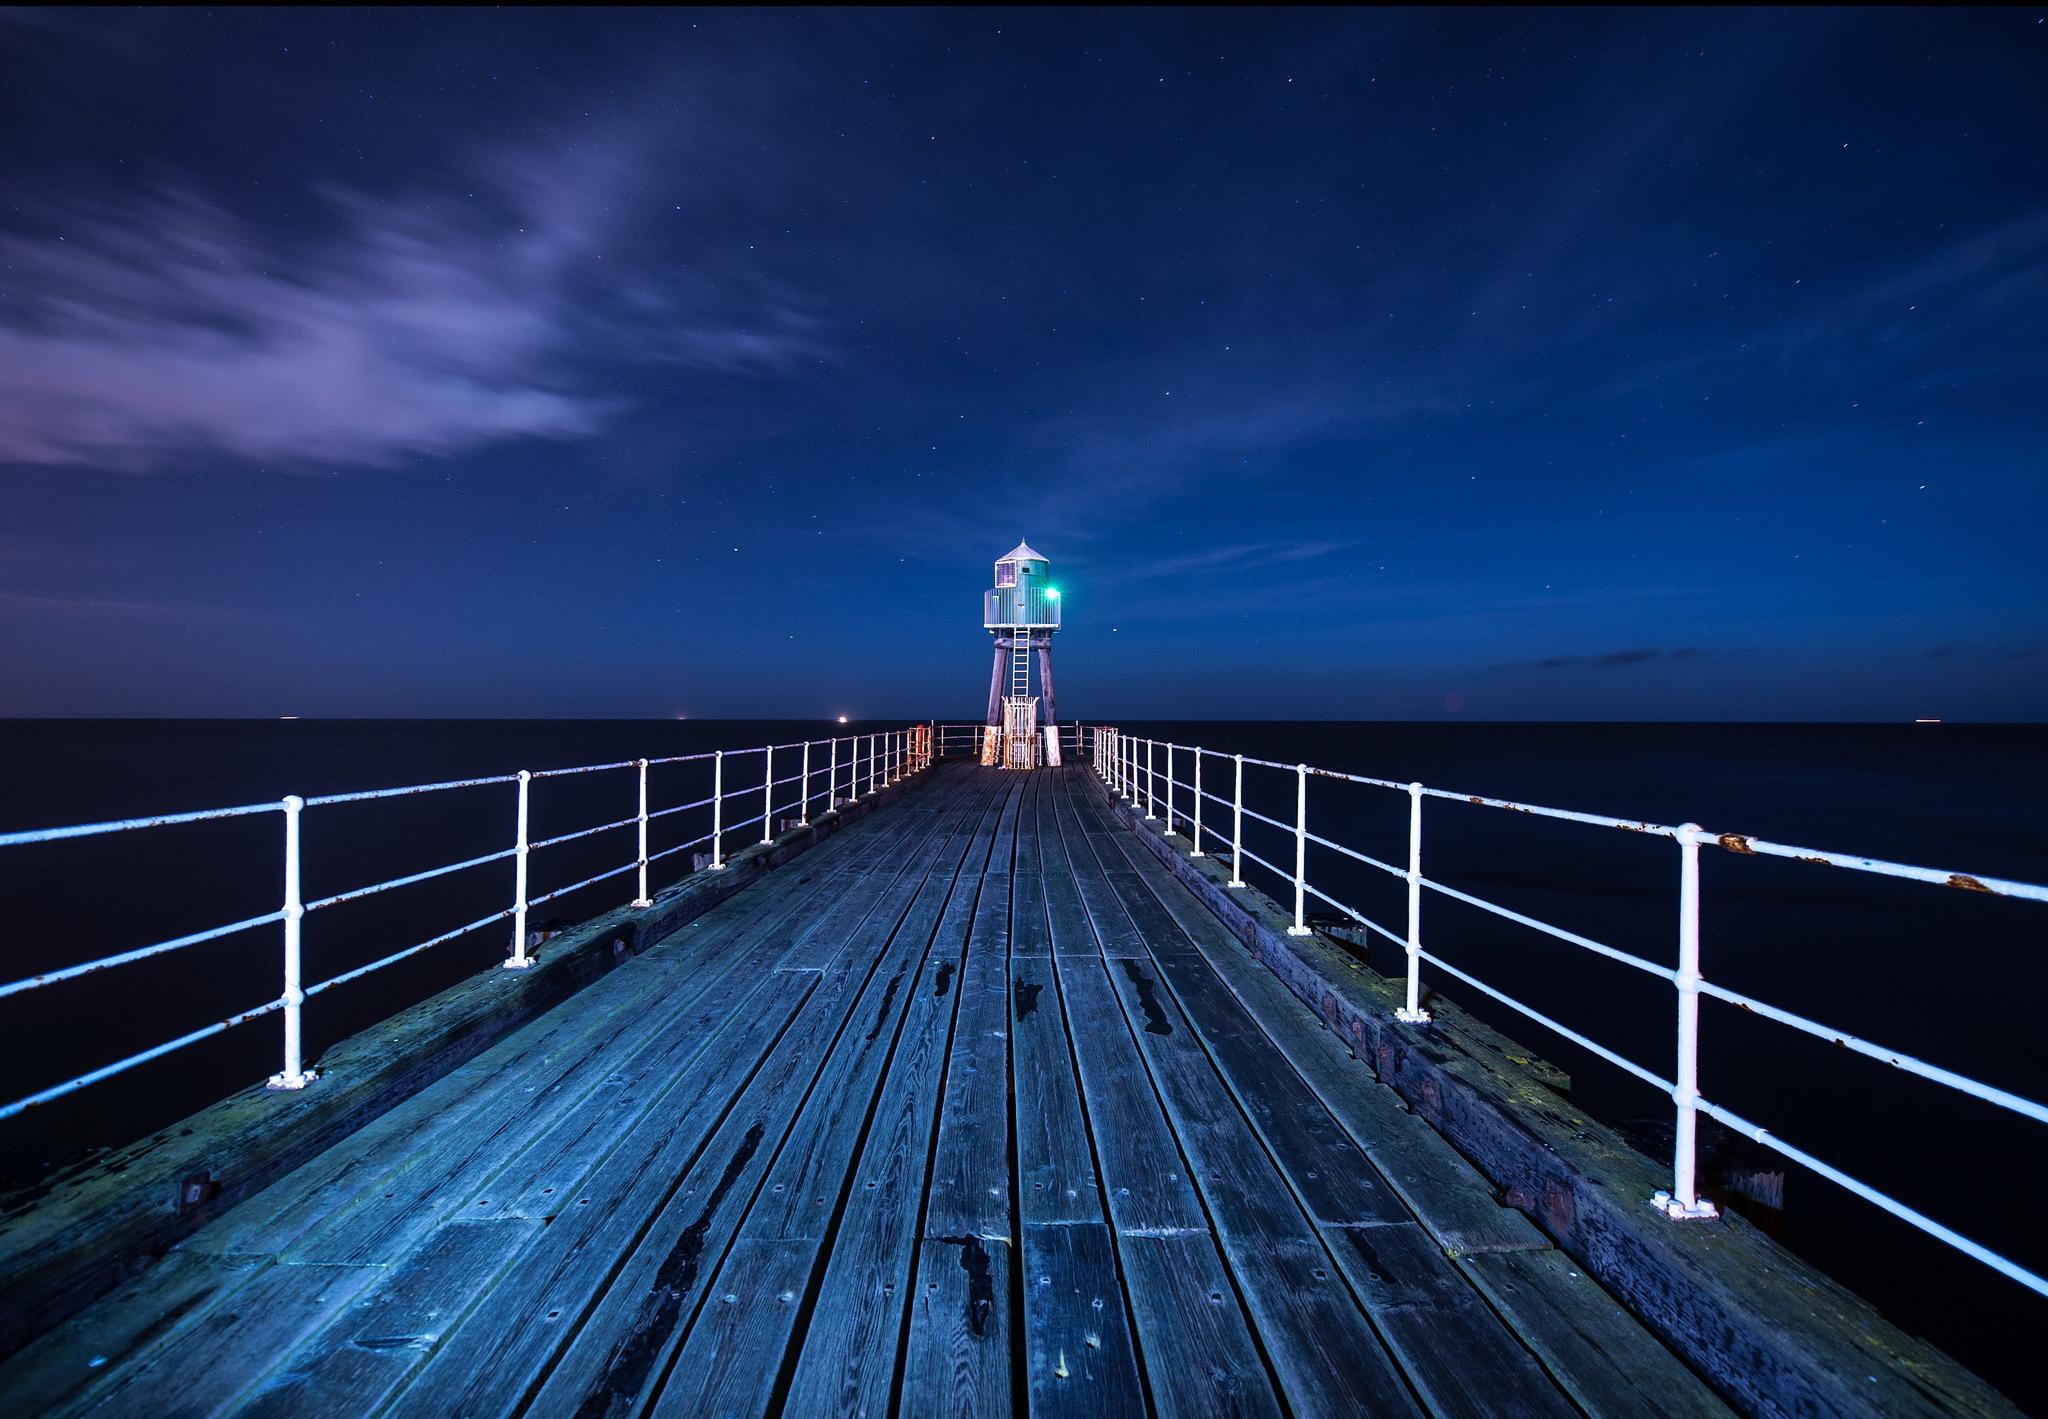 lighthouse at night - HD1920×1200